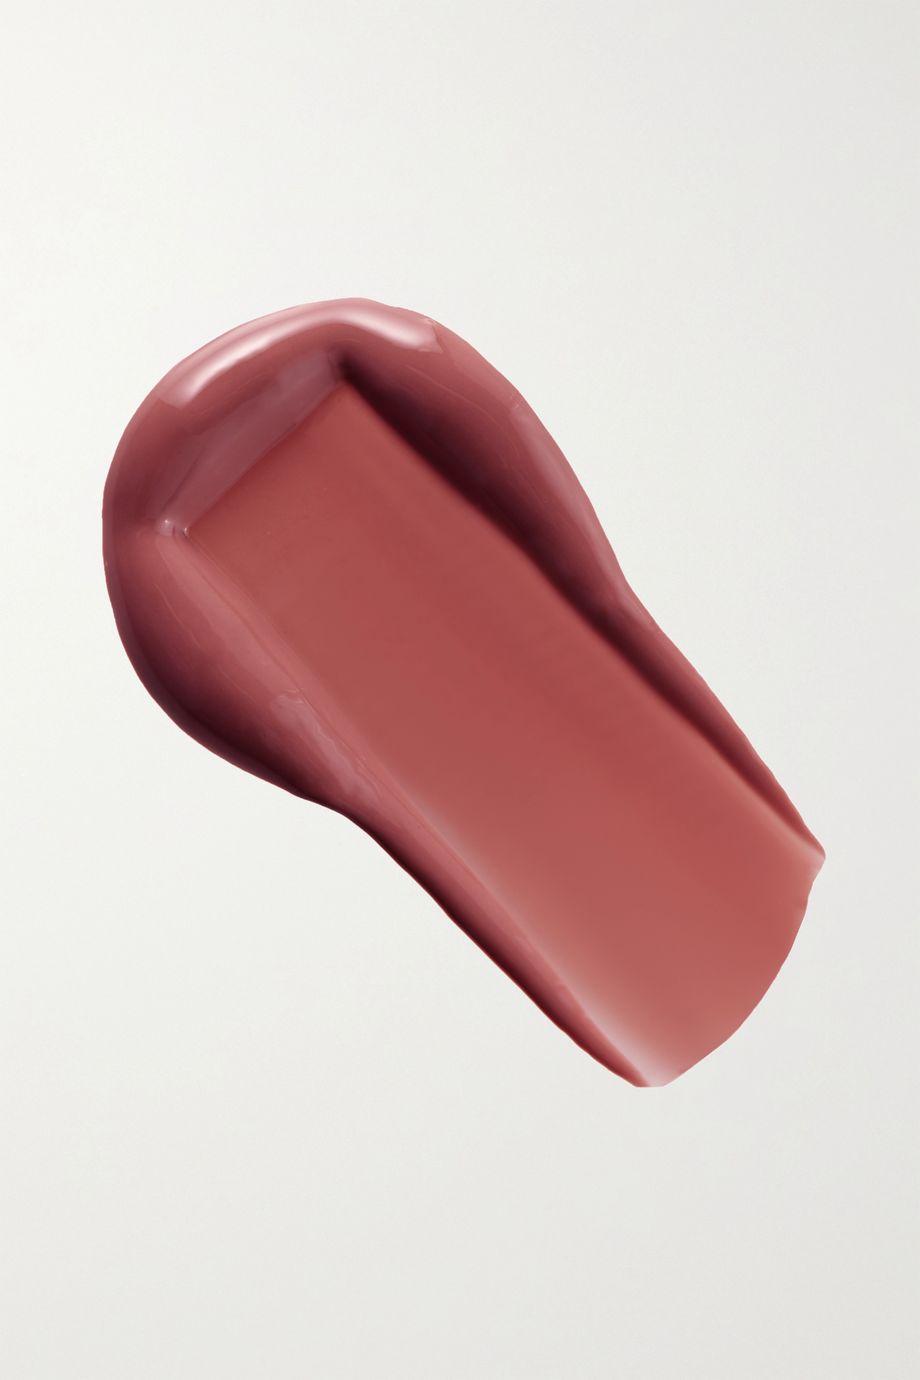 BY TERRY Rouge à lèvres liquide Lip Expert Shine, Hot Bare 4